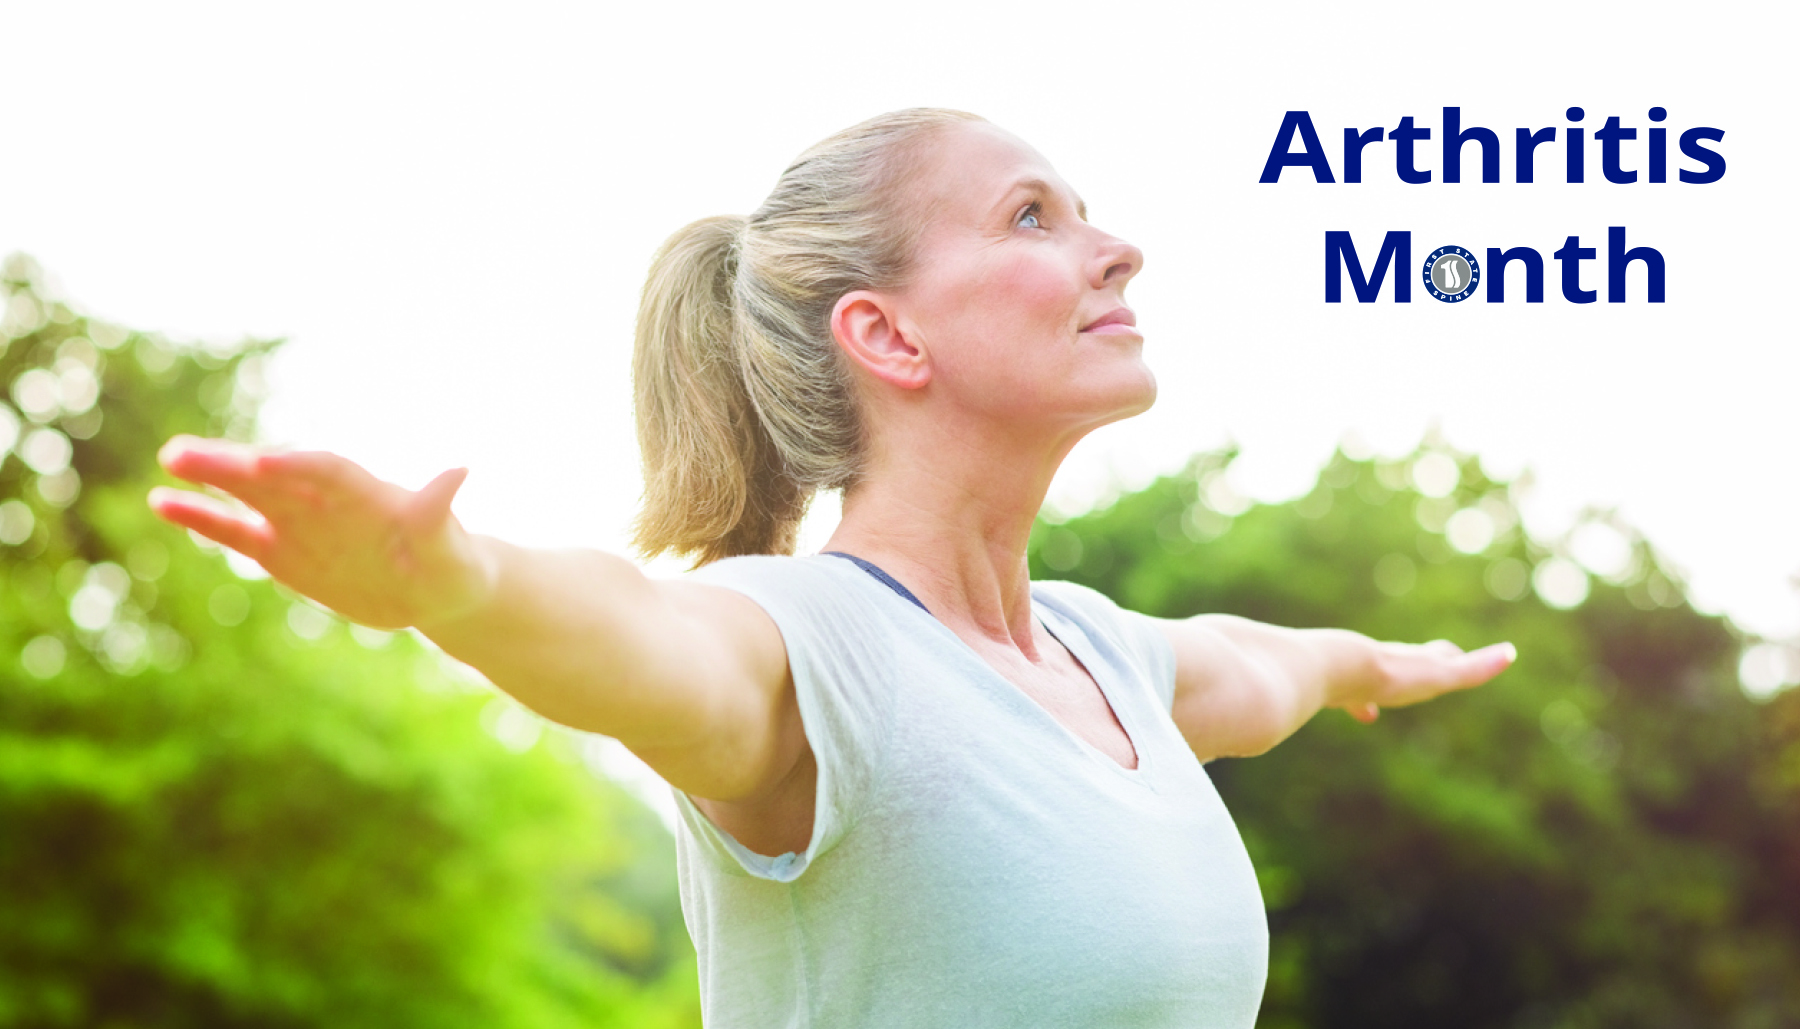 May is Arthritis Awareness Month